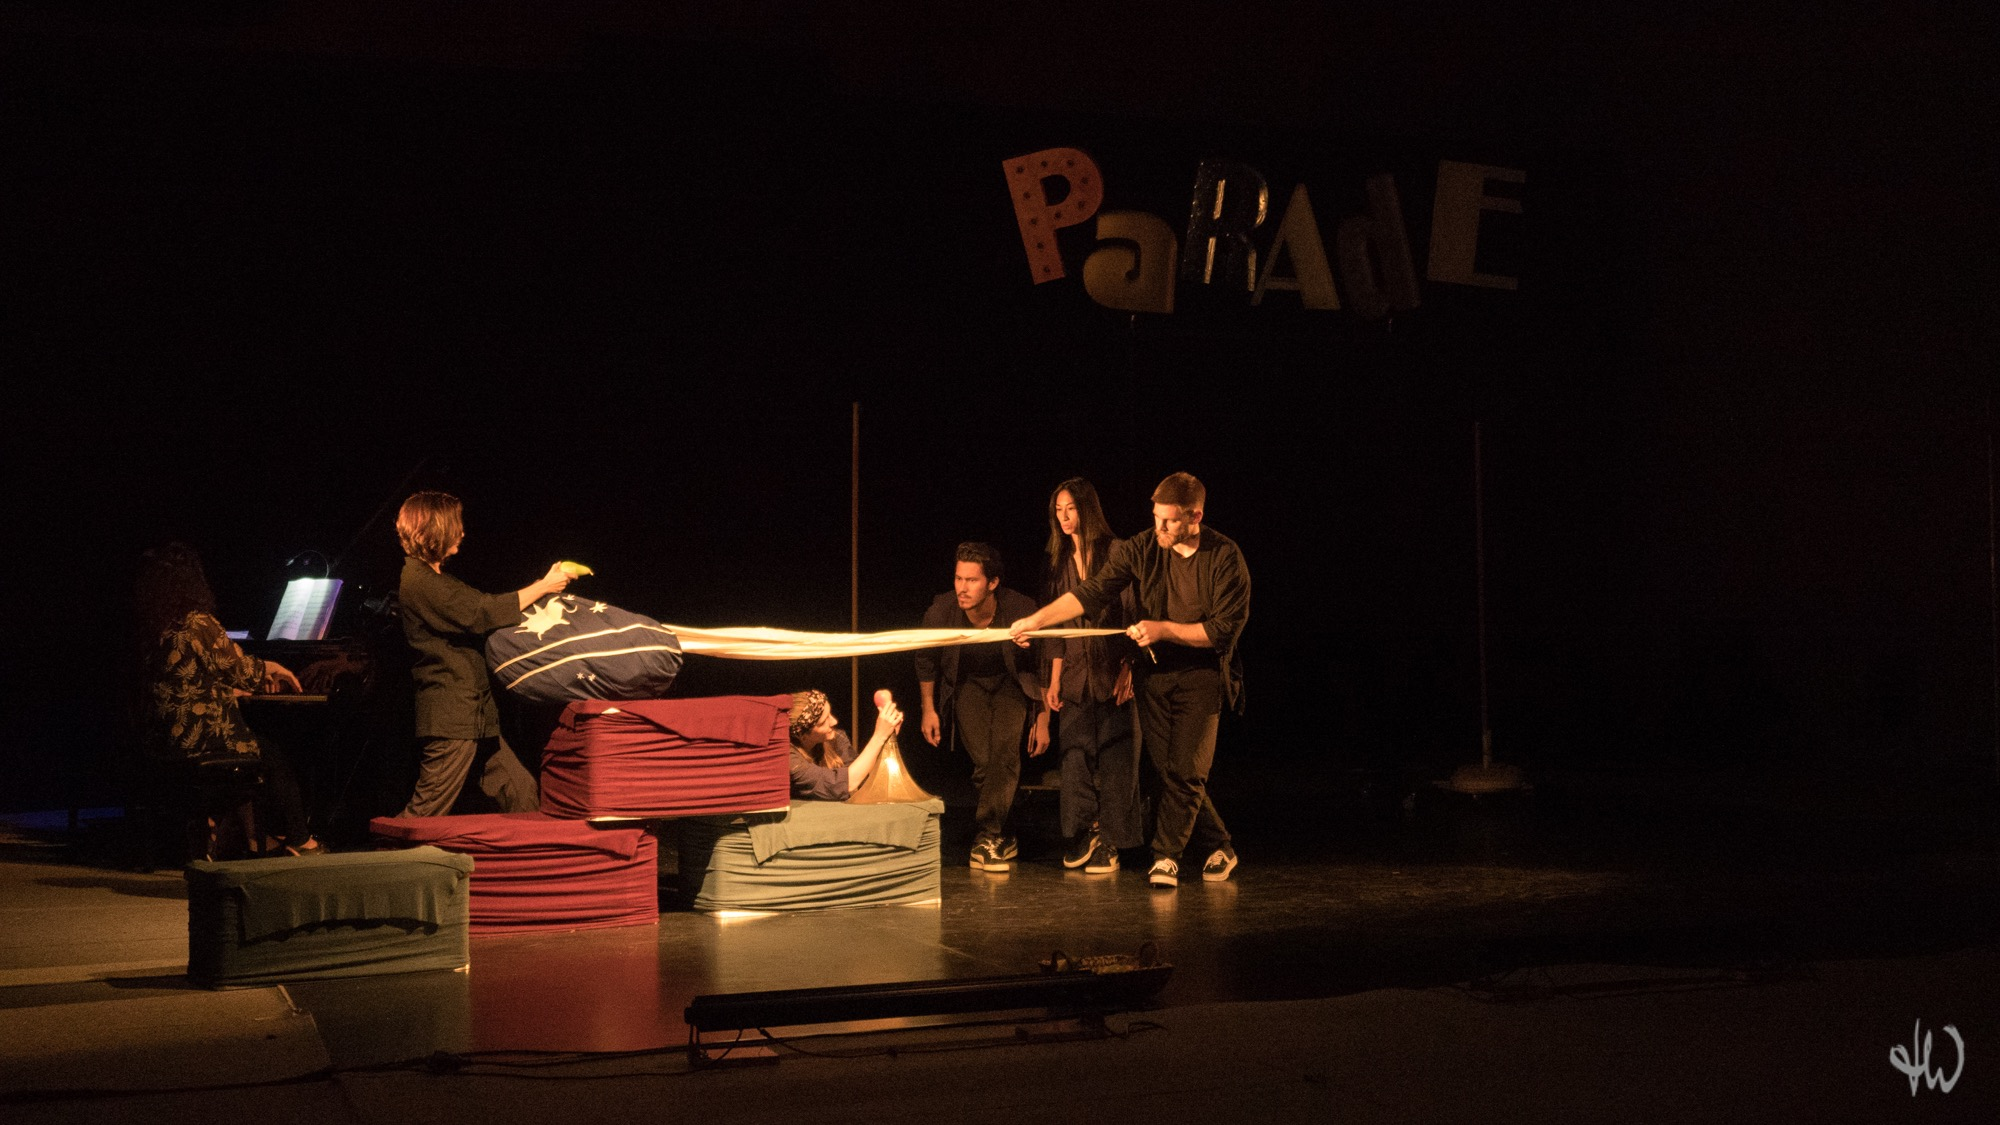 Copy of Copy of PARADE Picasso Satie Cocteau by Karin Schäfer Figuren Theater